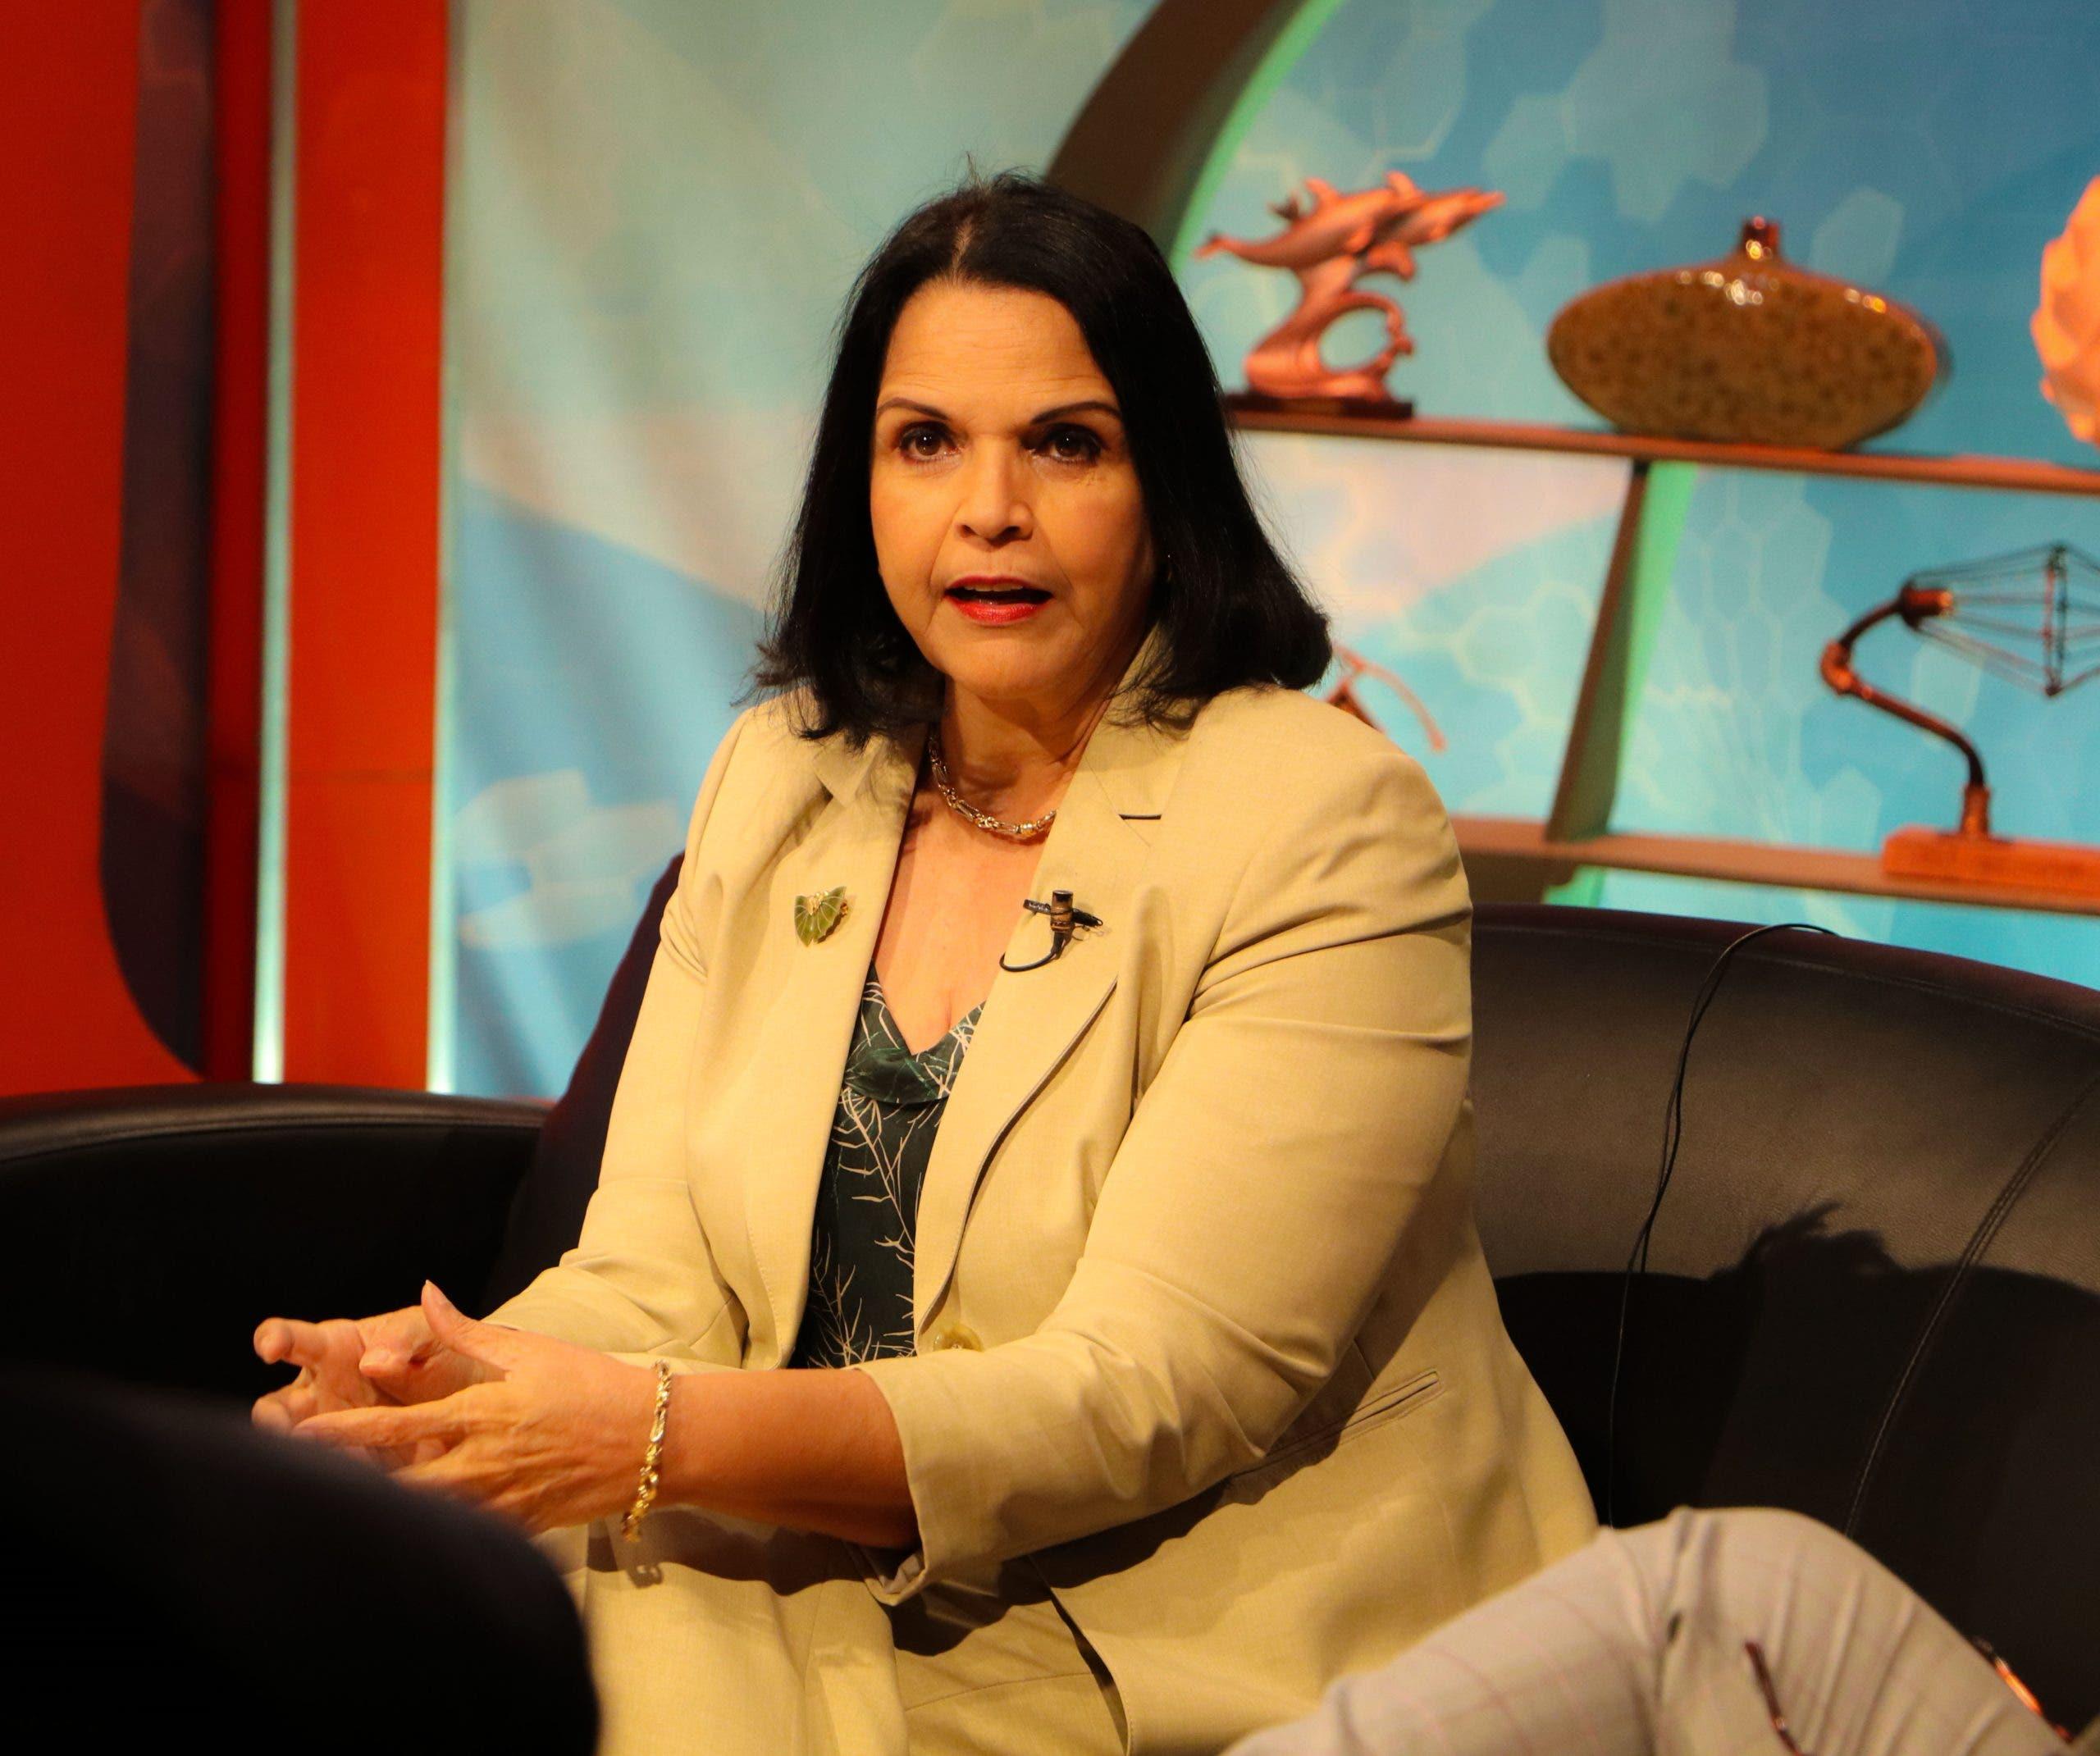 Minou Tavárez: El Senado tiene la responsabilidad de corregir atrasos del Código Penal